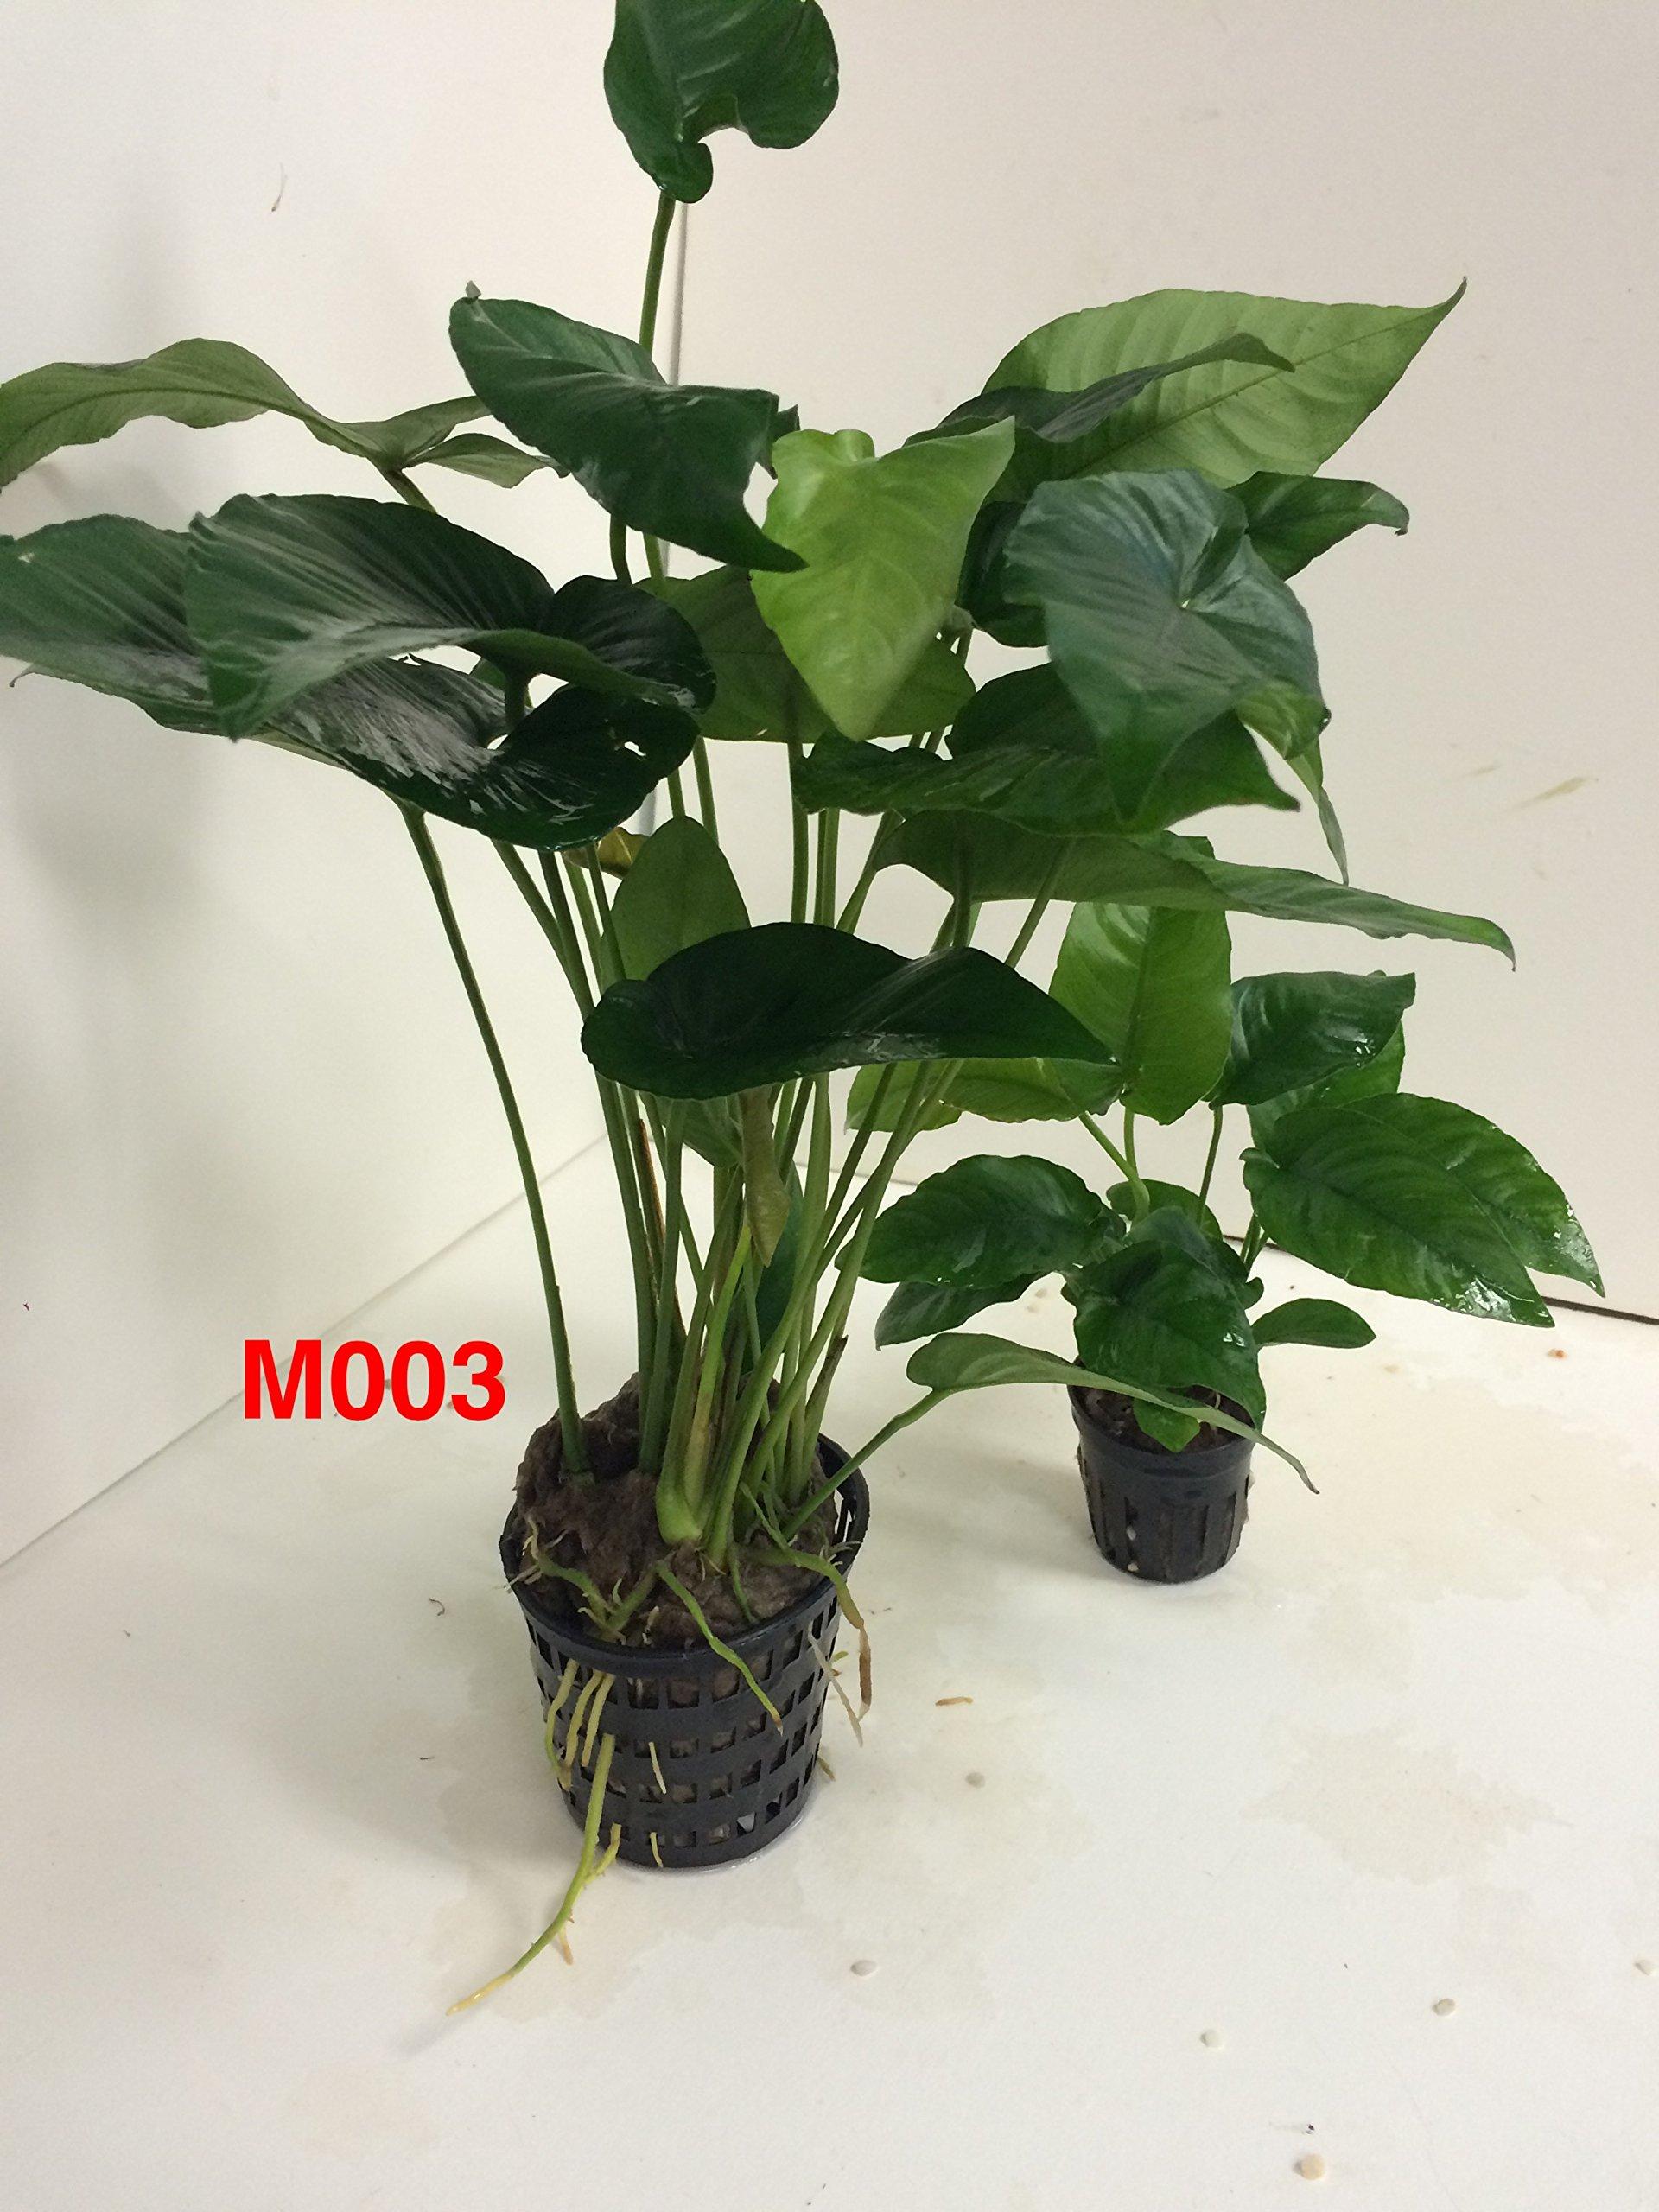 Anubias barteri striped Mother Pot Plant M003 Live Aquatic Plant by Jayco